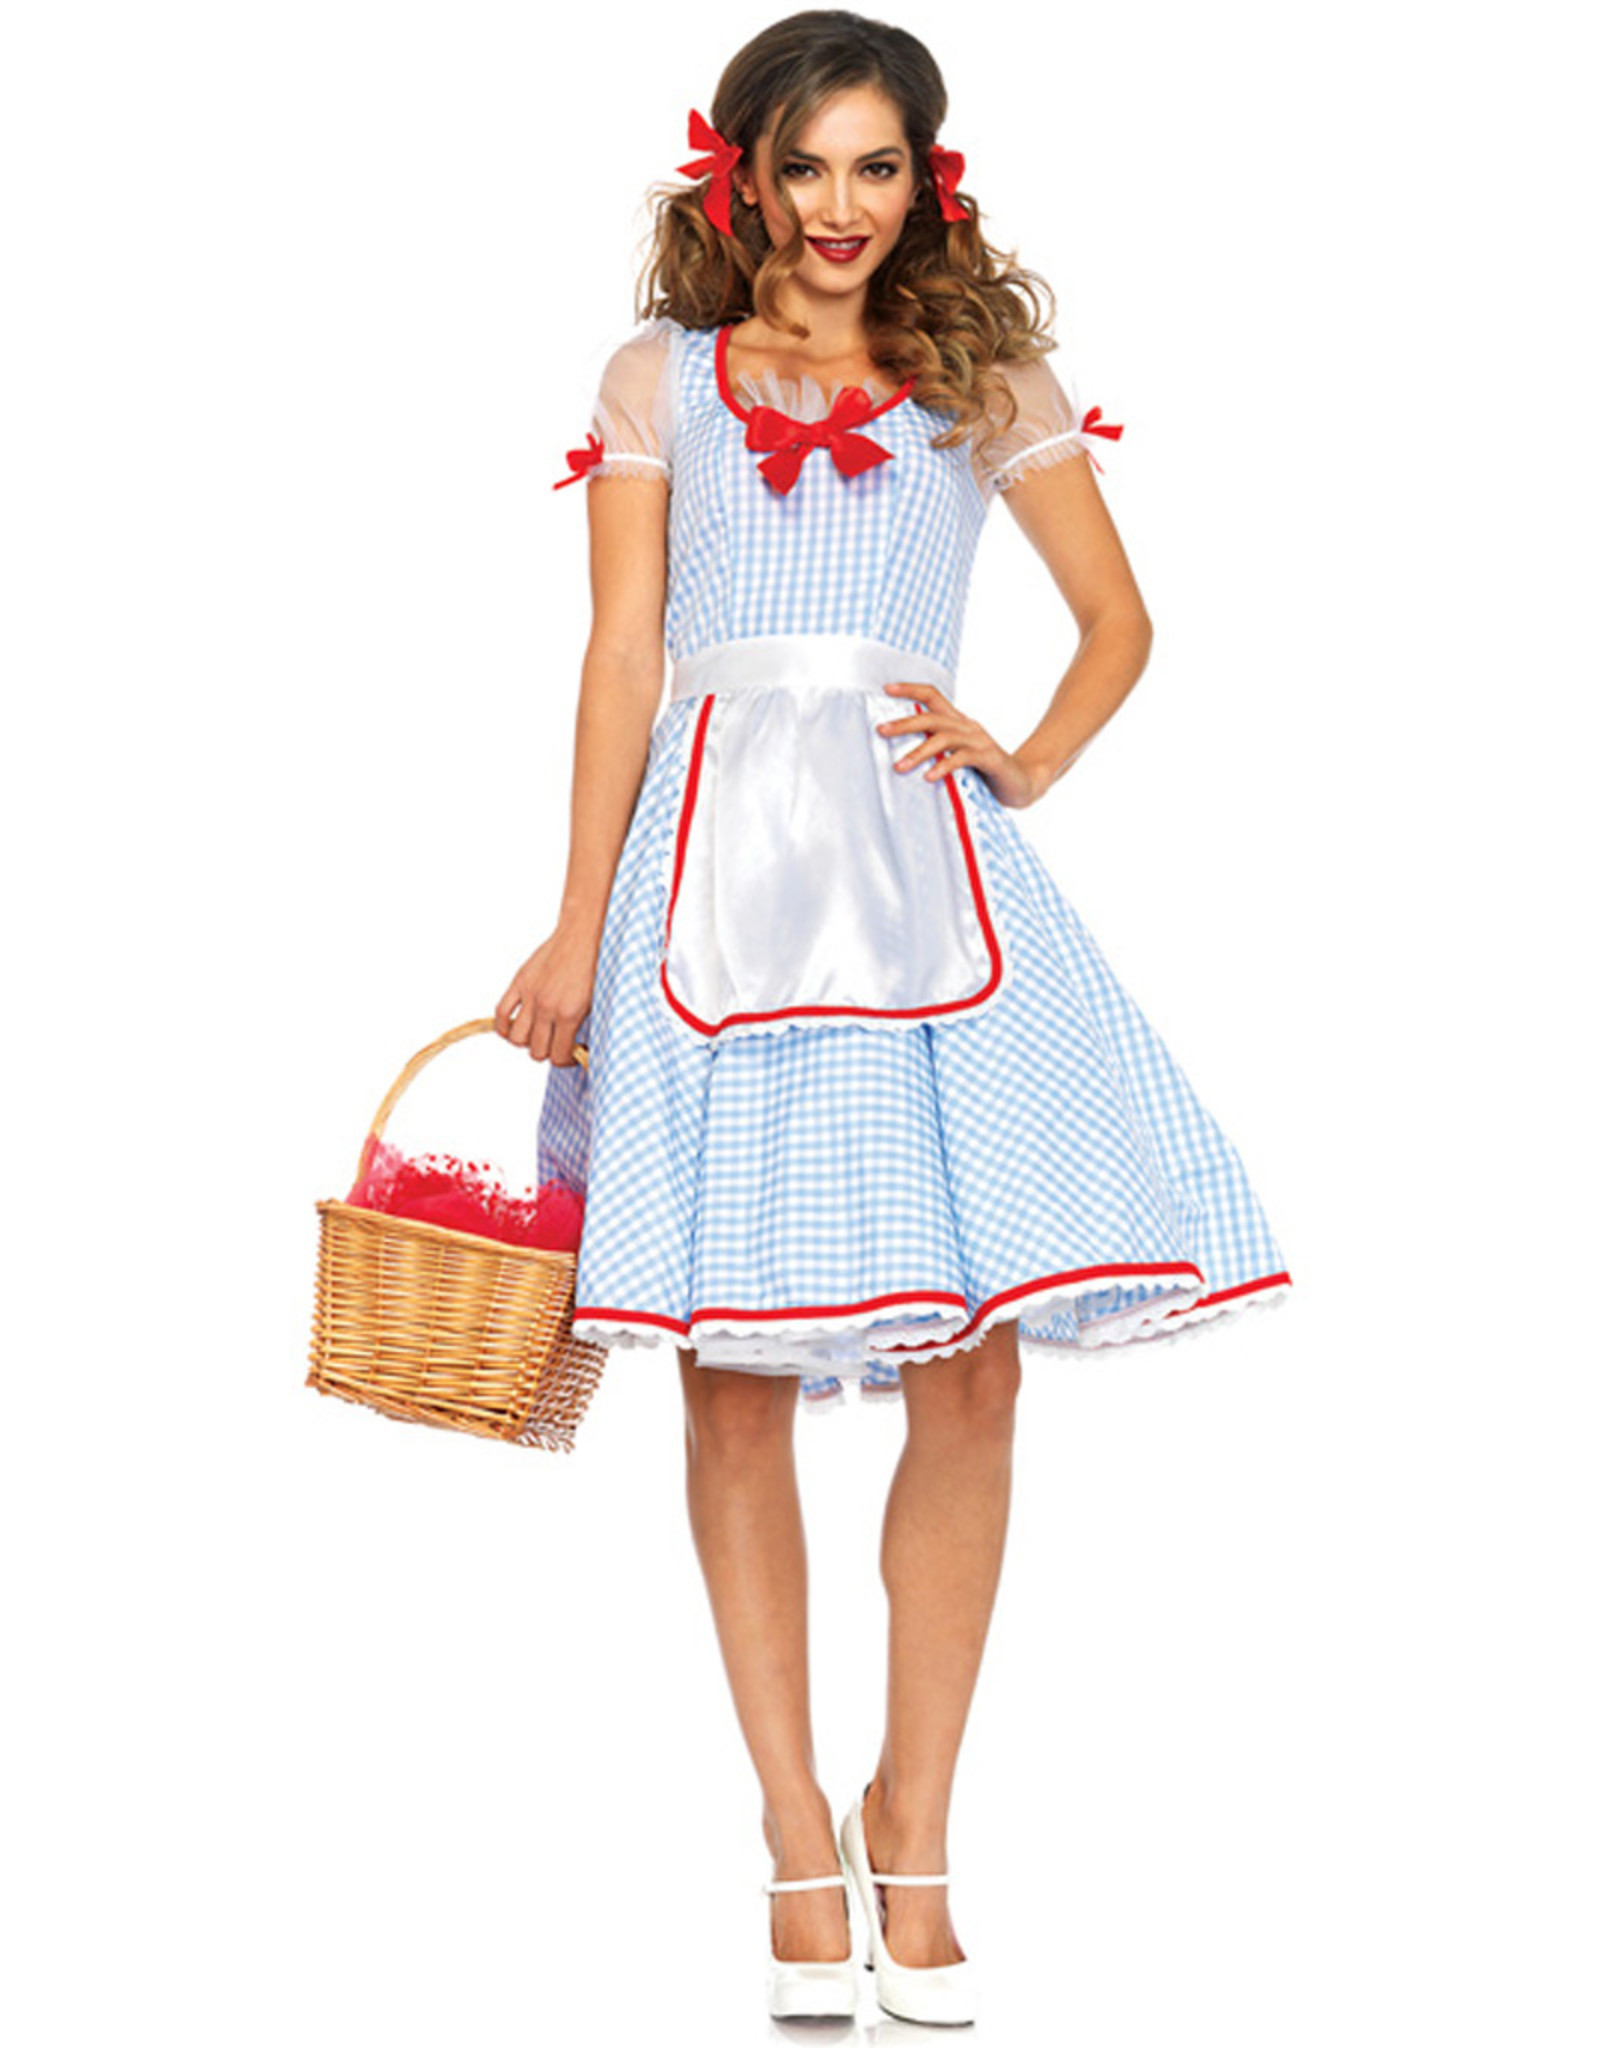 Kansas Sweetie Costume - Women's